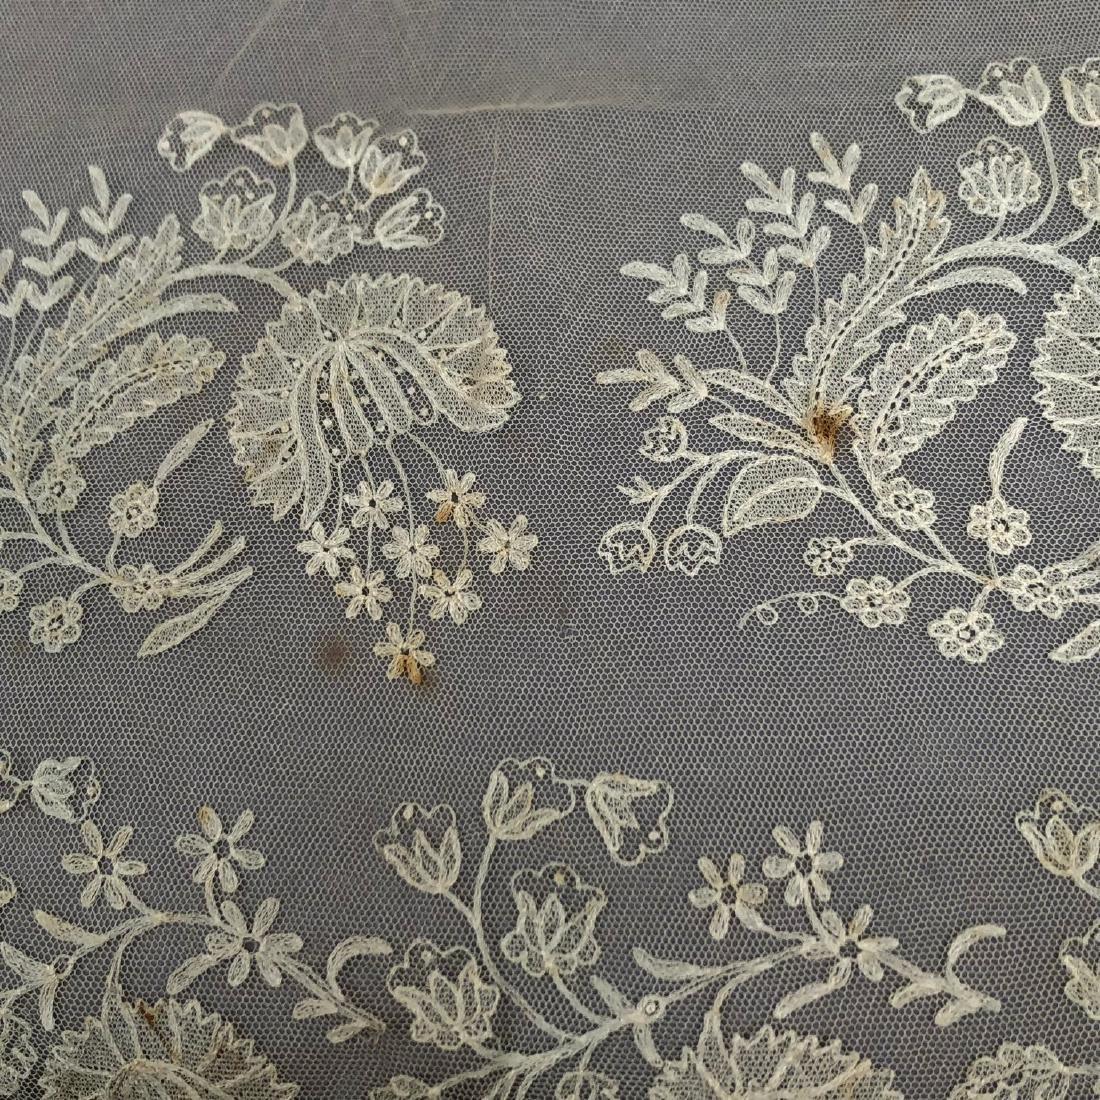 FOUR CREAM EMBROIDERED NET BONNET VEILS, 1810 - 1830 - 6